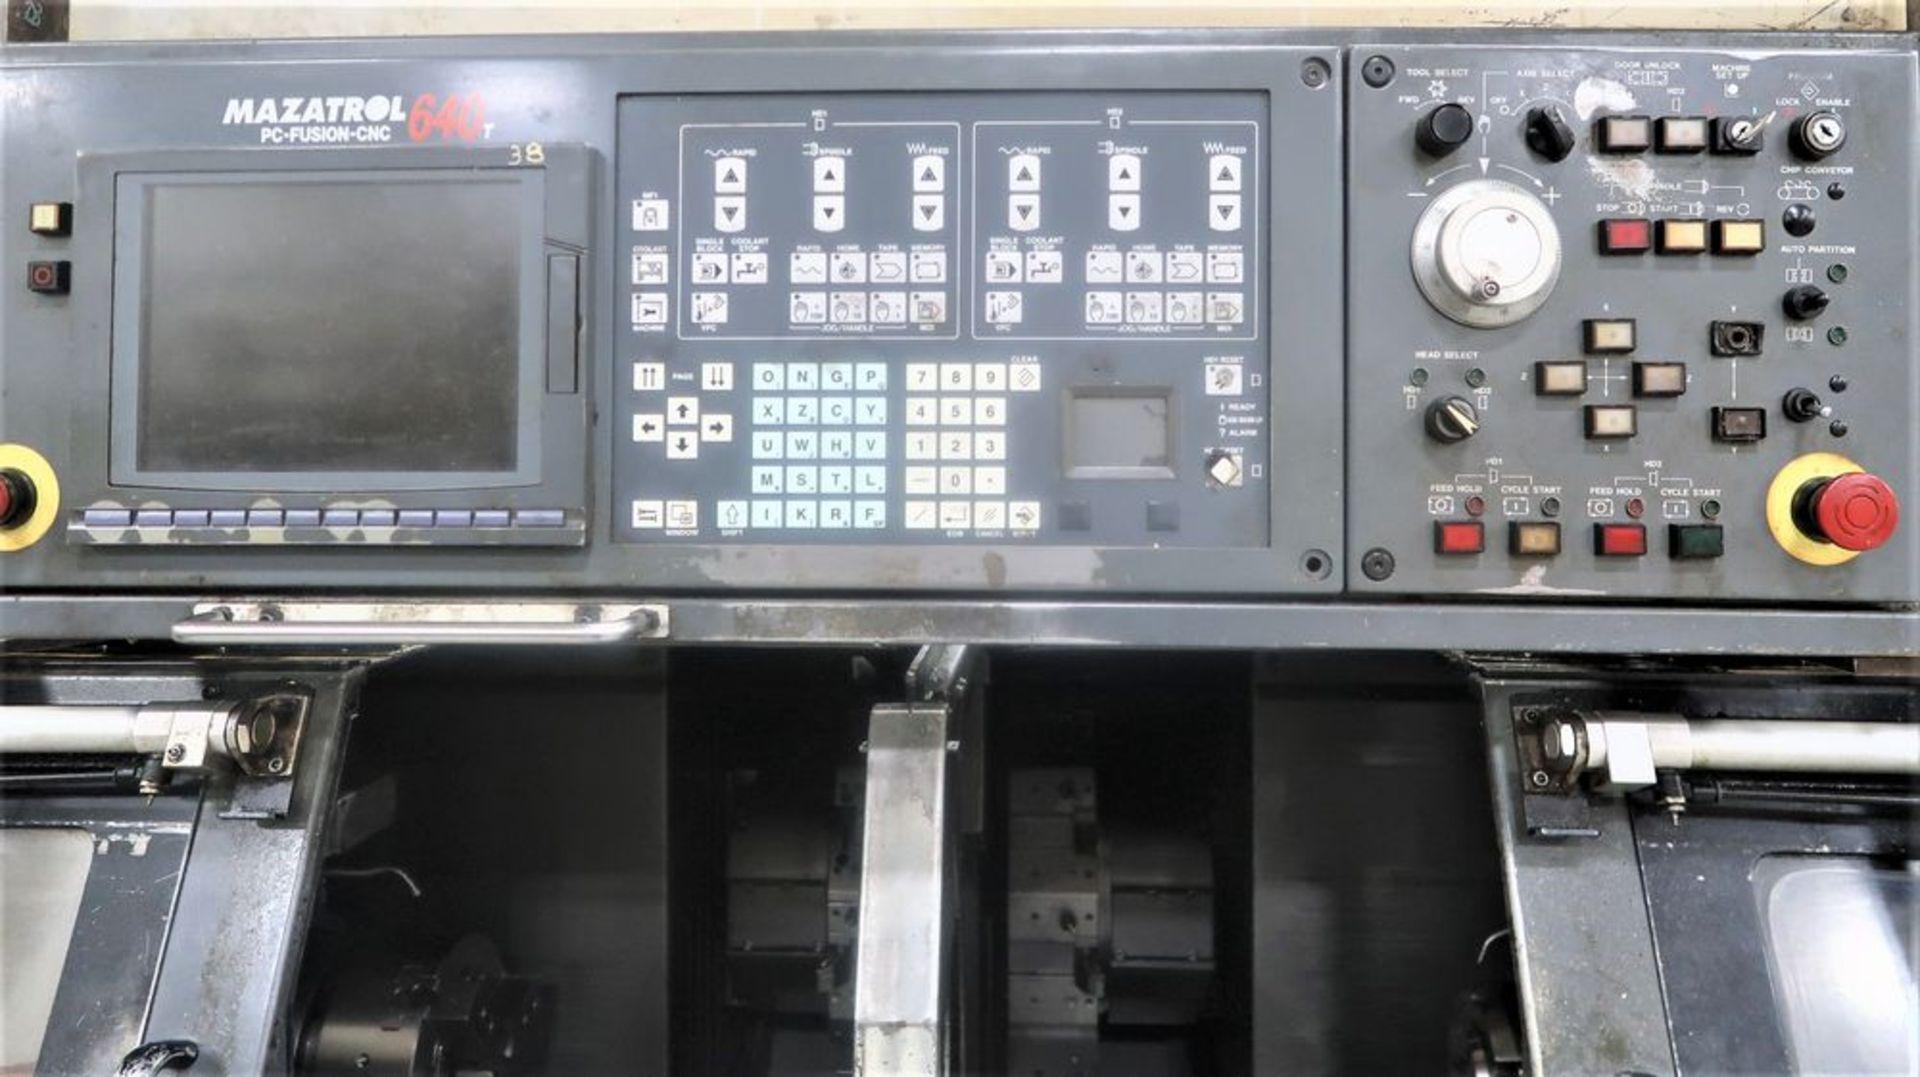 Mazak Dual Turn 25 Twin Spindle CNC Turning Center lathe, S/N 150888 - Image 9 of 13